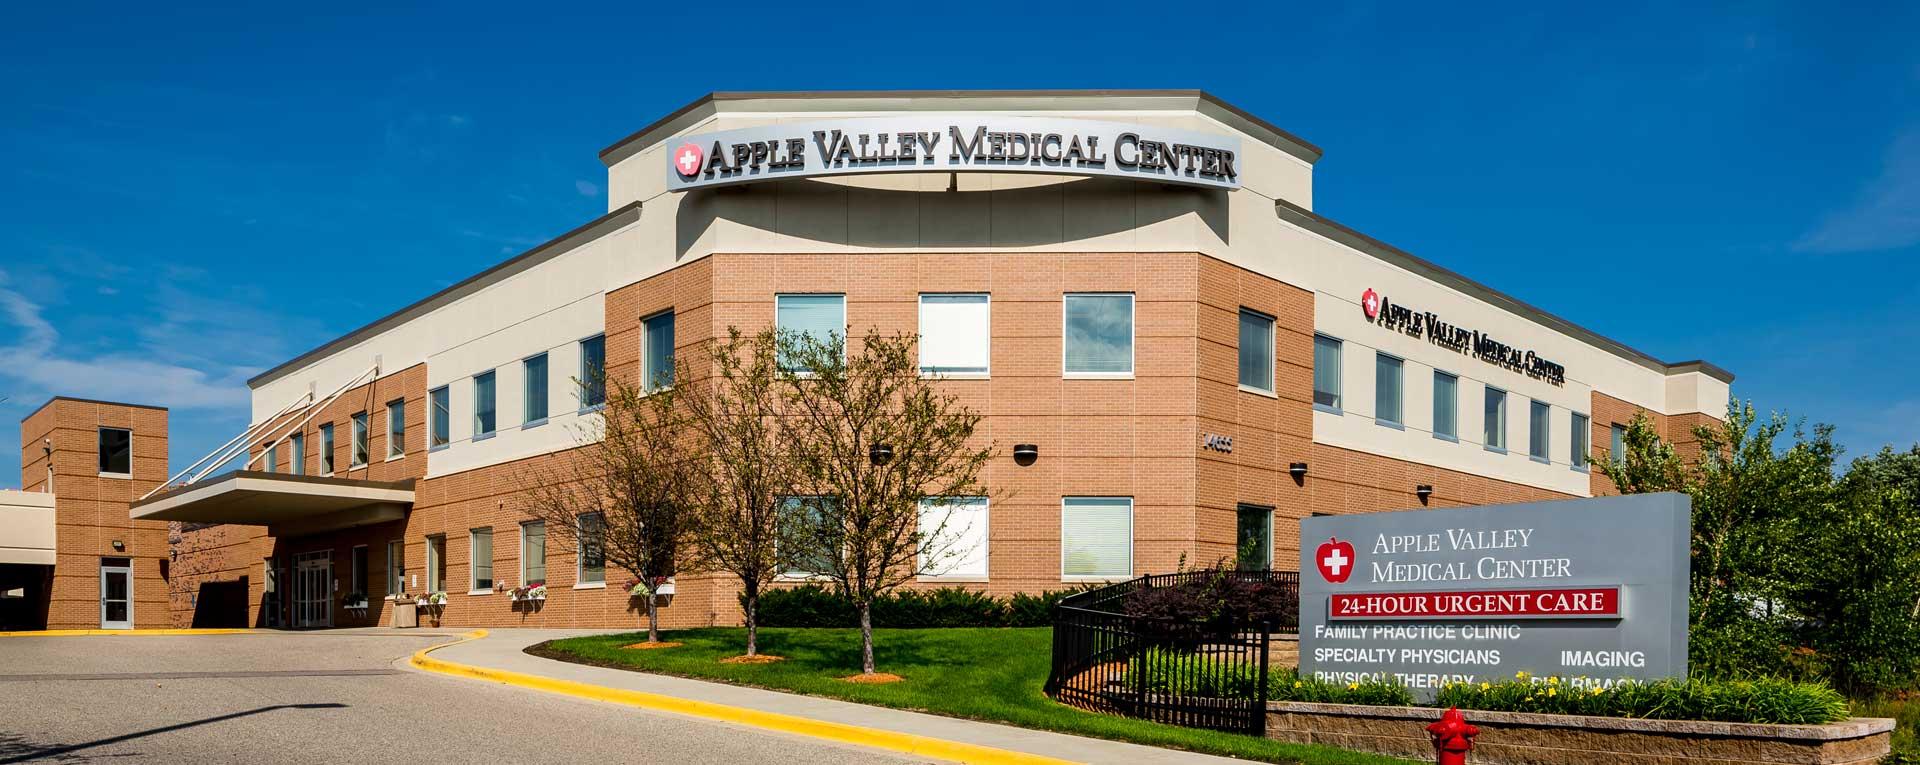 Apple Valley Medical Center - Apple Valley, MN